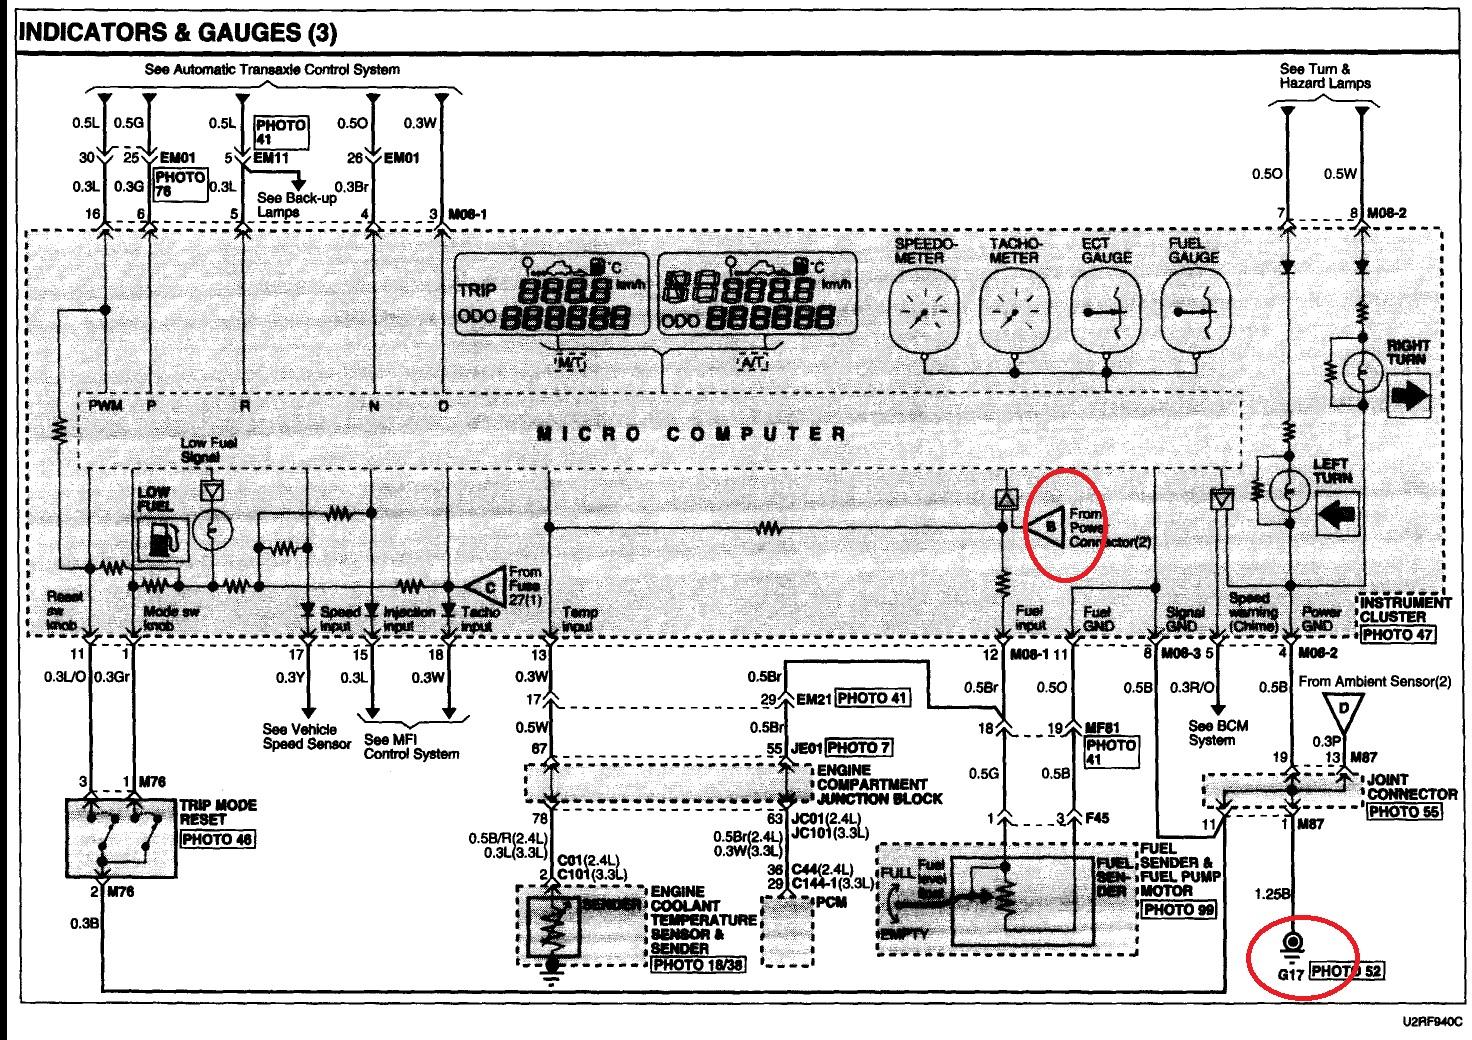 2007 Hyundai Accent Ignition Wiring Diagram : Hyundai accent wiring diagram images